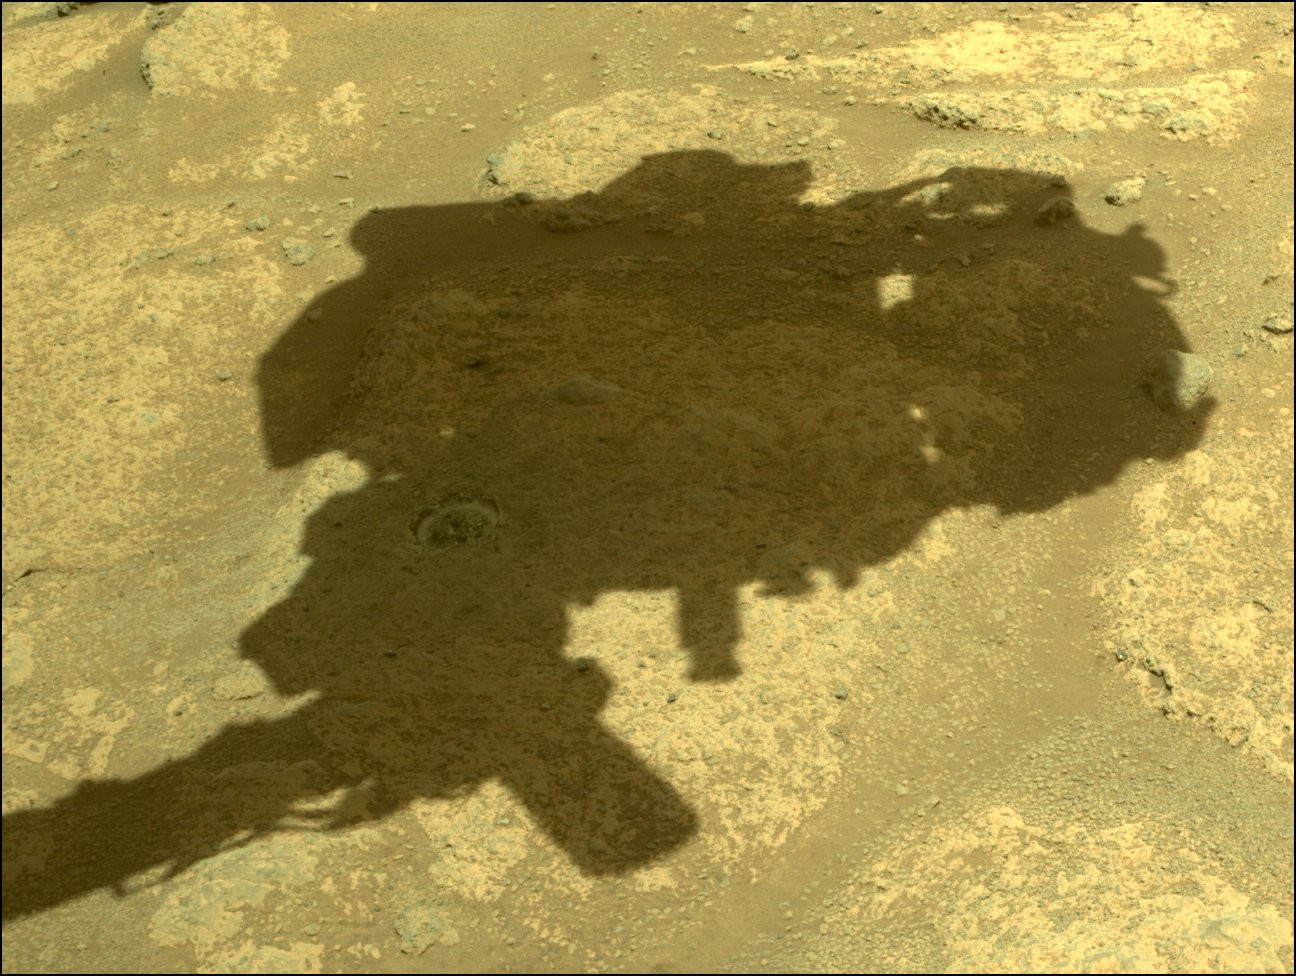 Mars 2020 (Perseverance - Ingenuity) : exploration du cratère Jezero - Page 19 12082